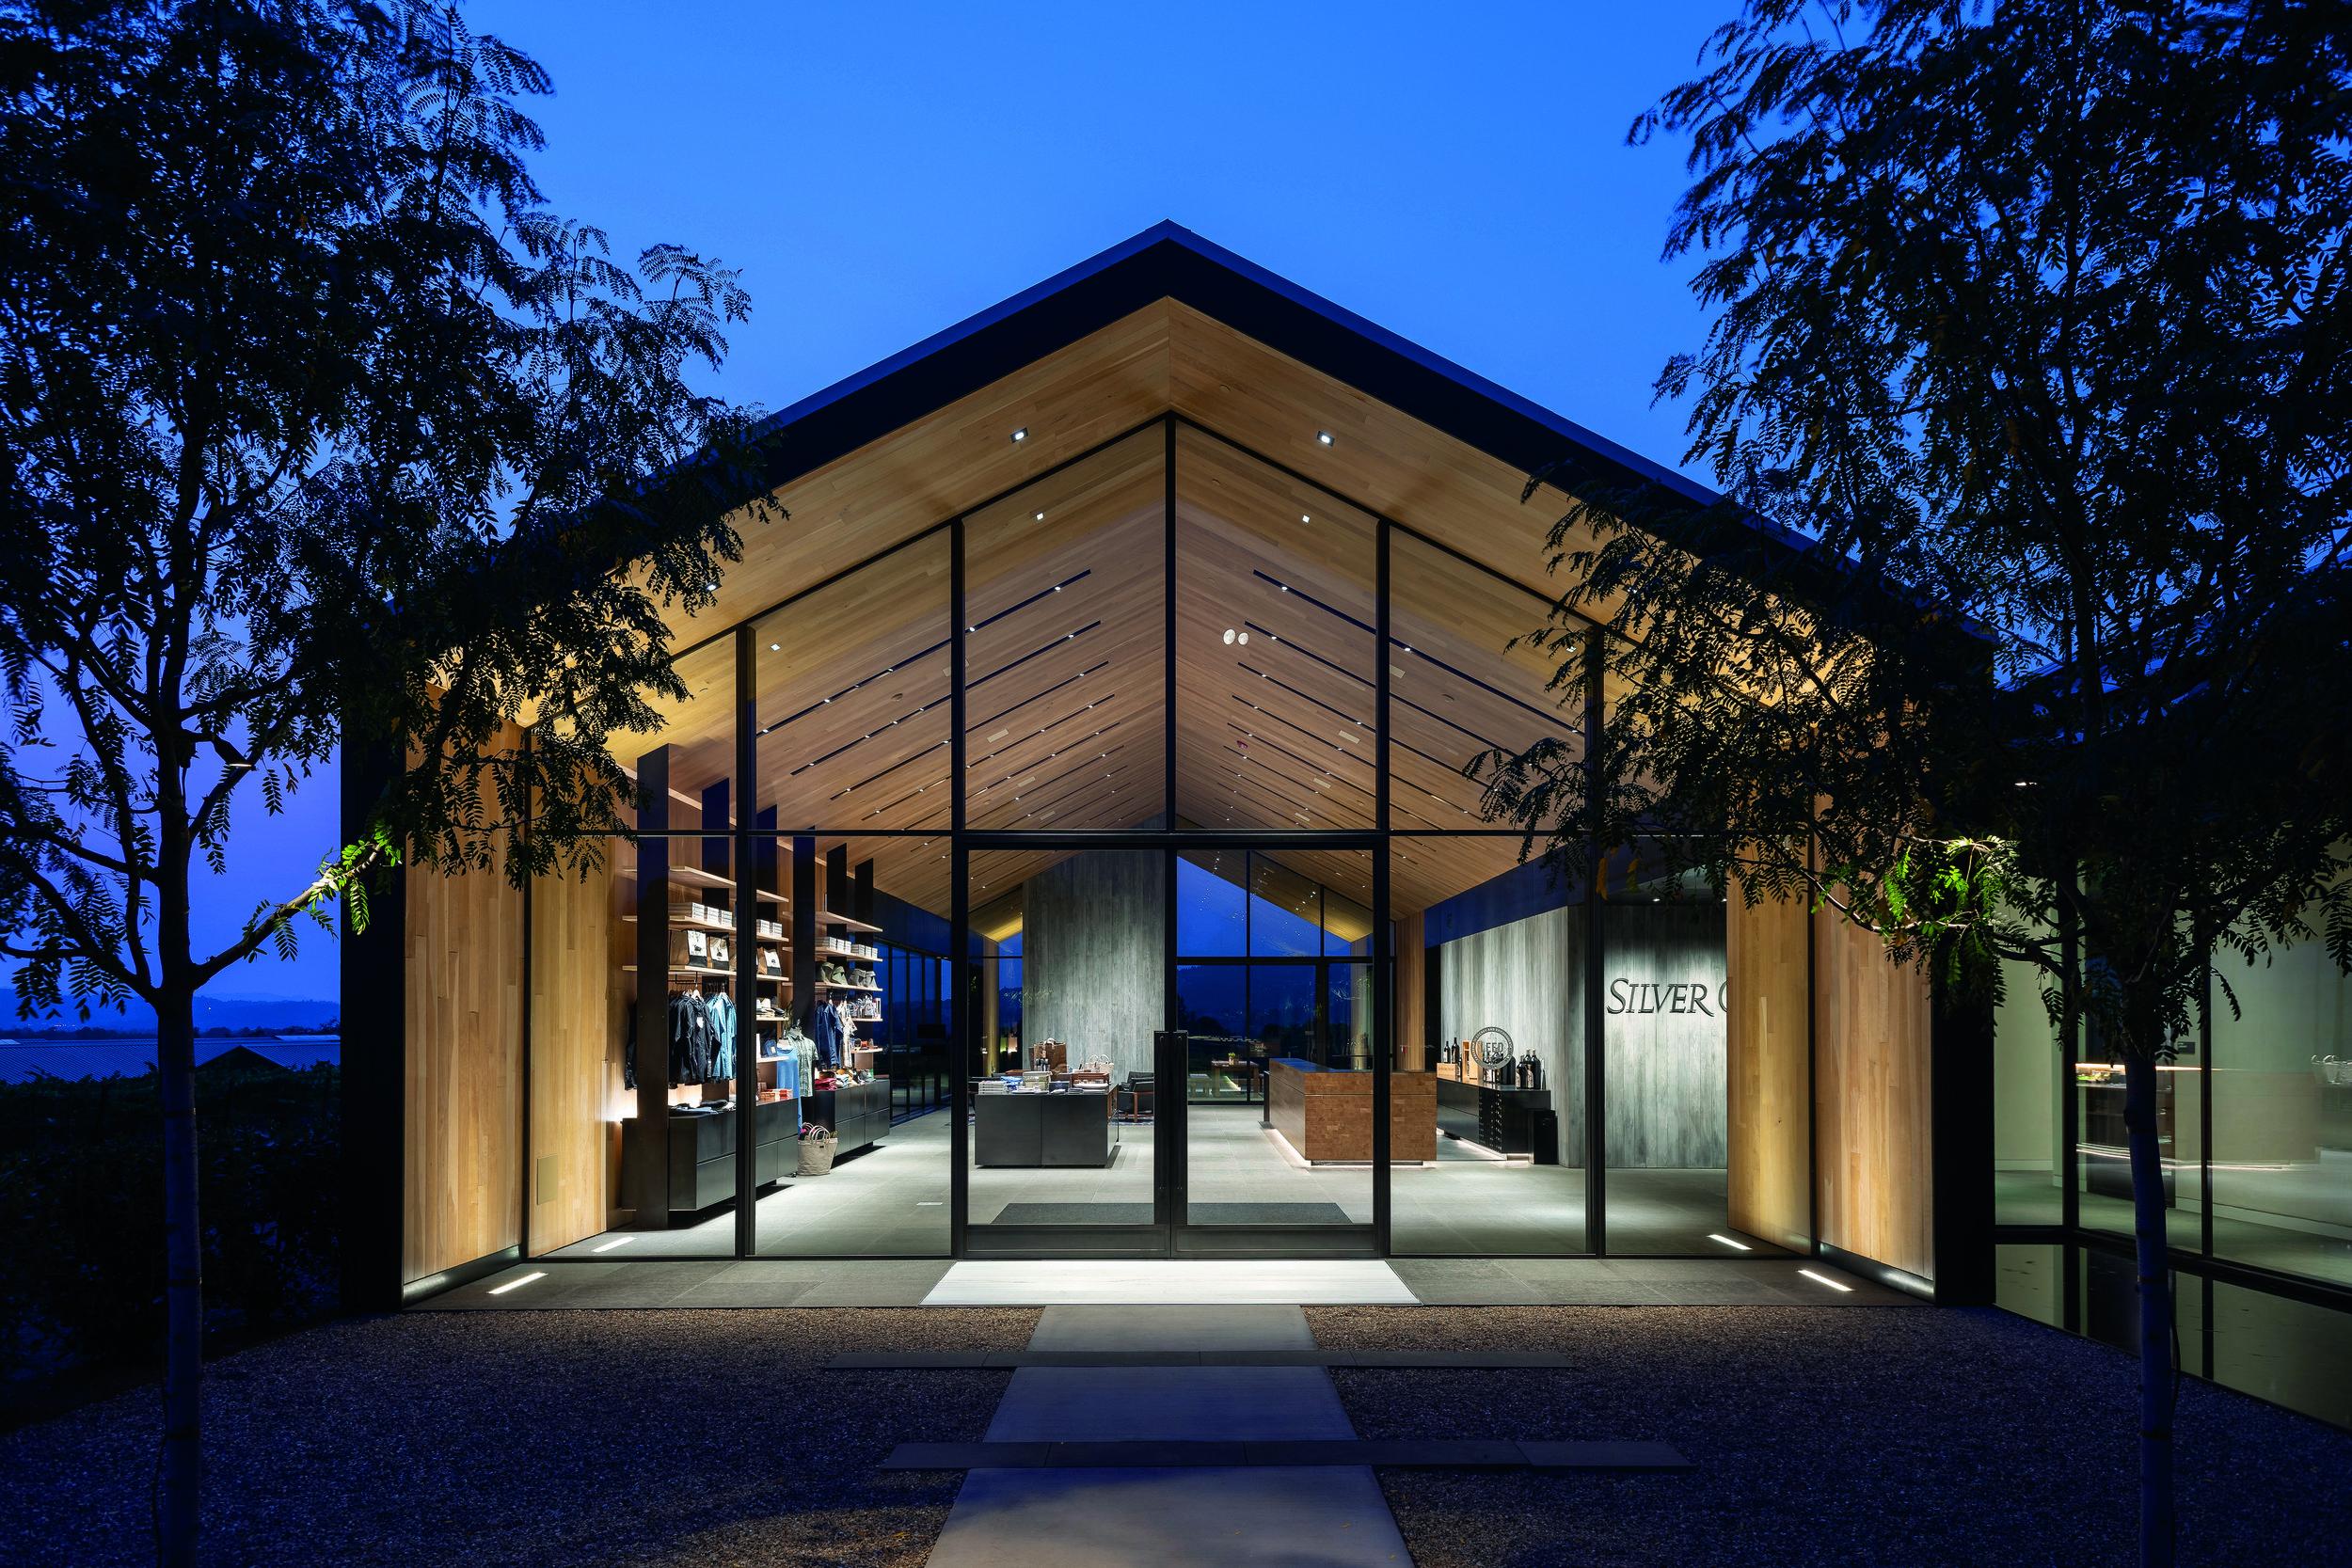 Award of Distinction, First PlaceEric Johnson Associates, Inc.Silver Oak Alexander Valley Winery Interior - Lighting Designers: Eric Johnson, Markus Wolf